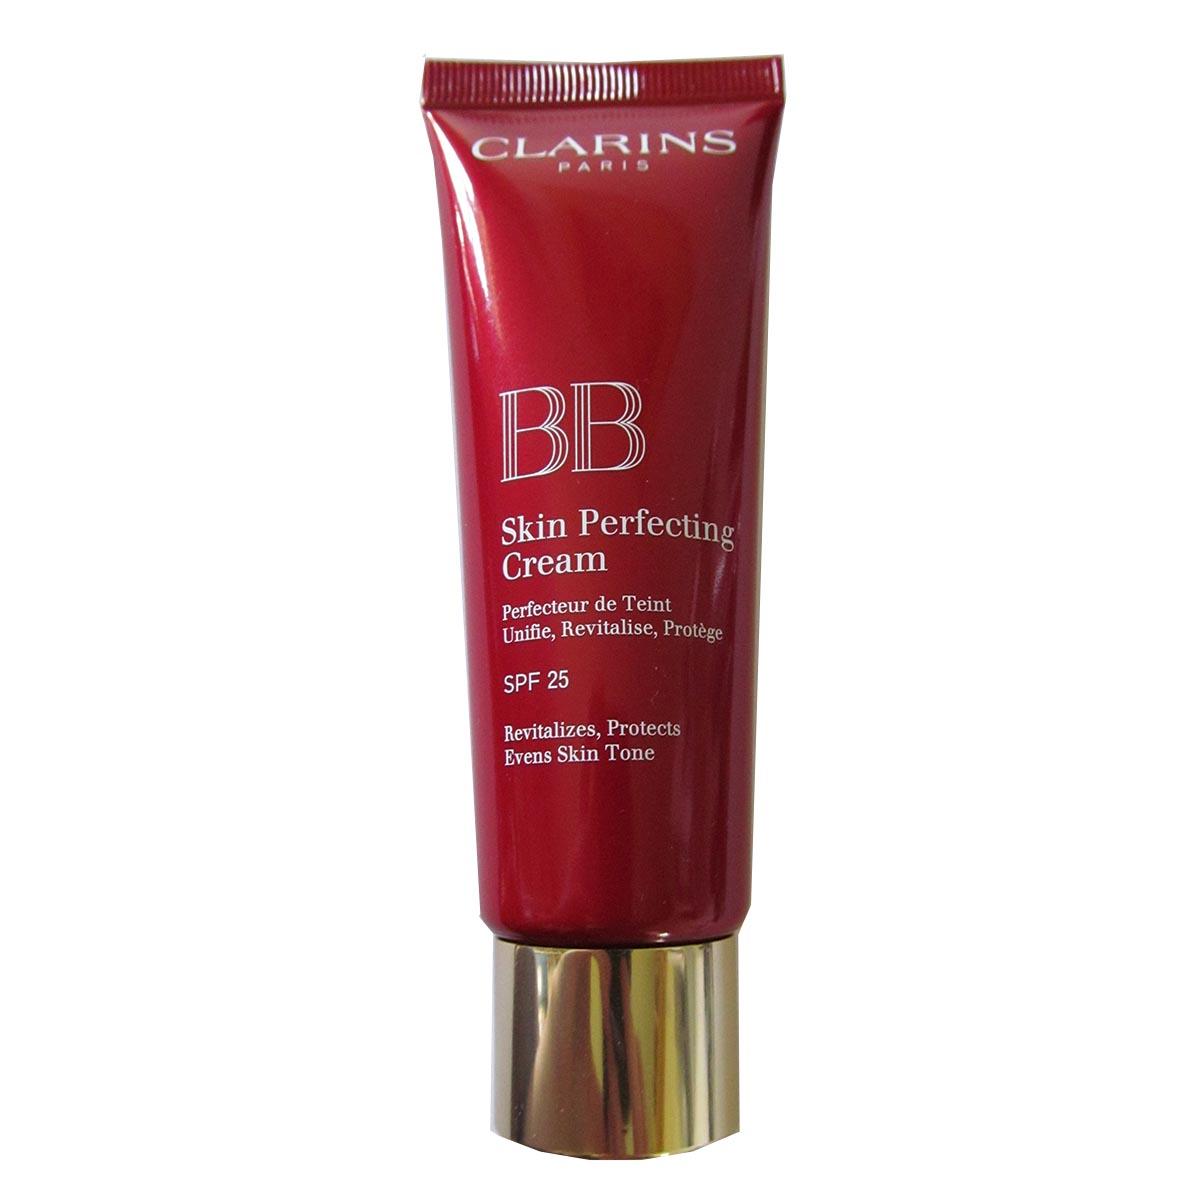 Clarins bb skin perfecting spf25 fluid 03 45ml